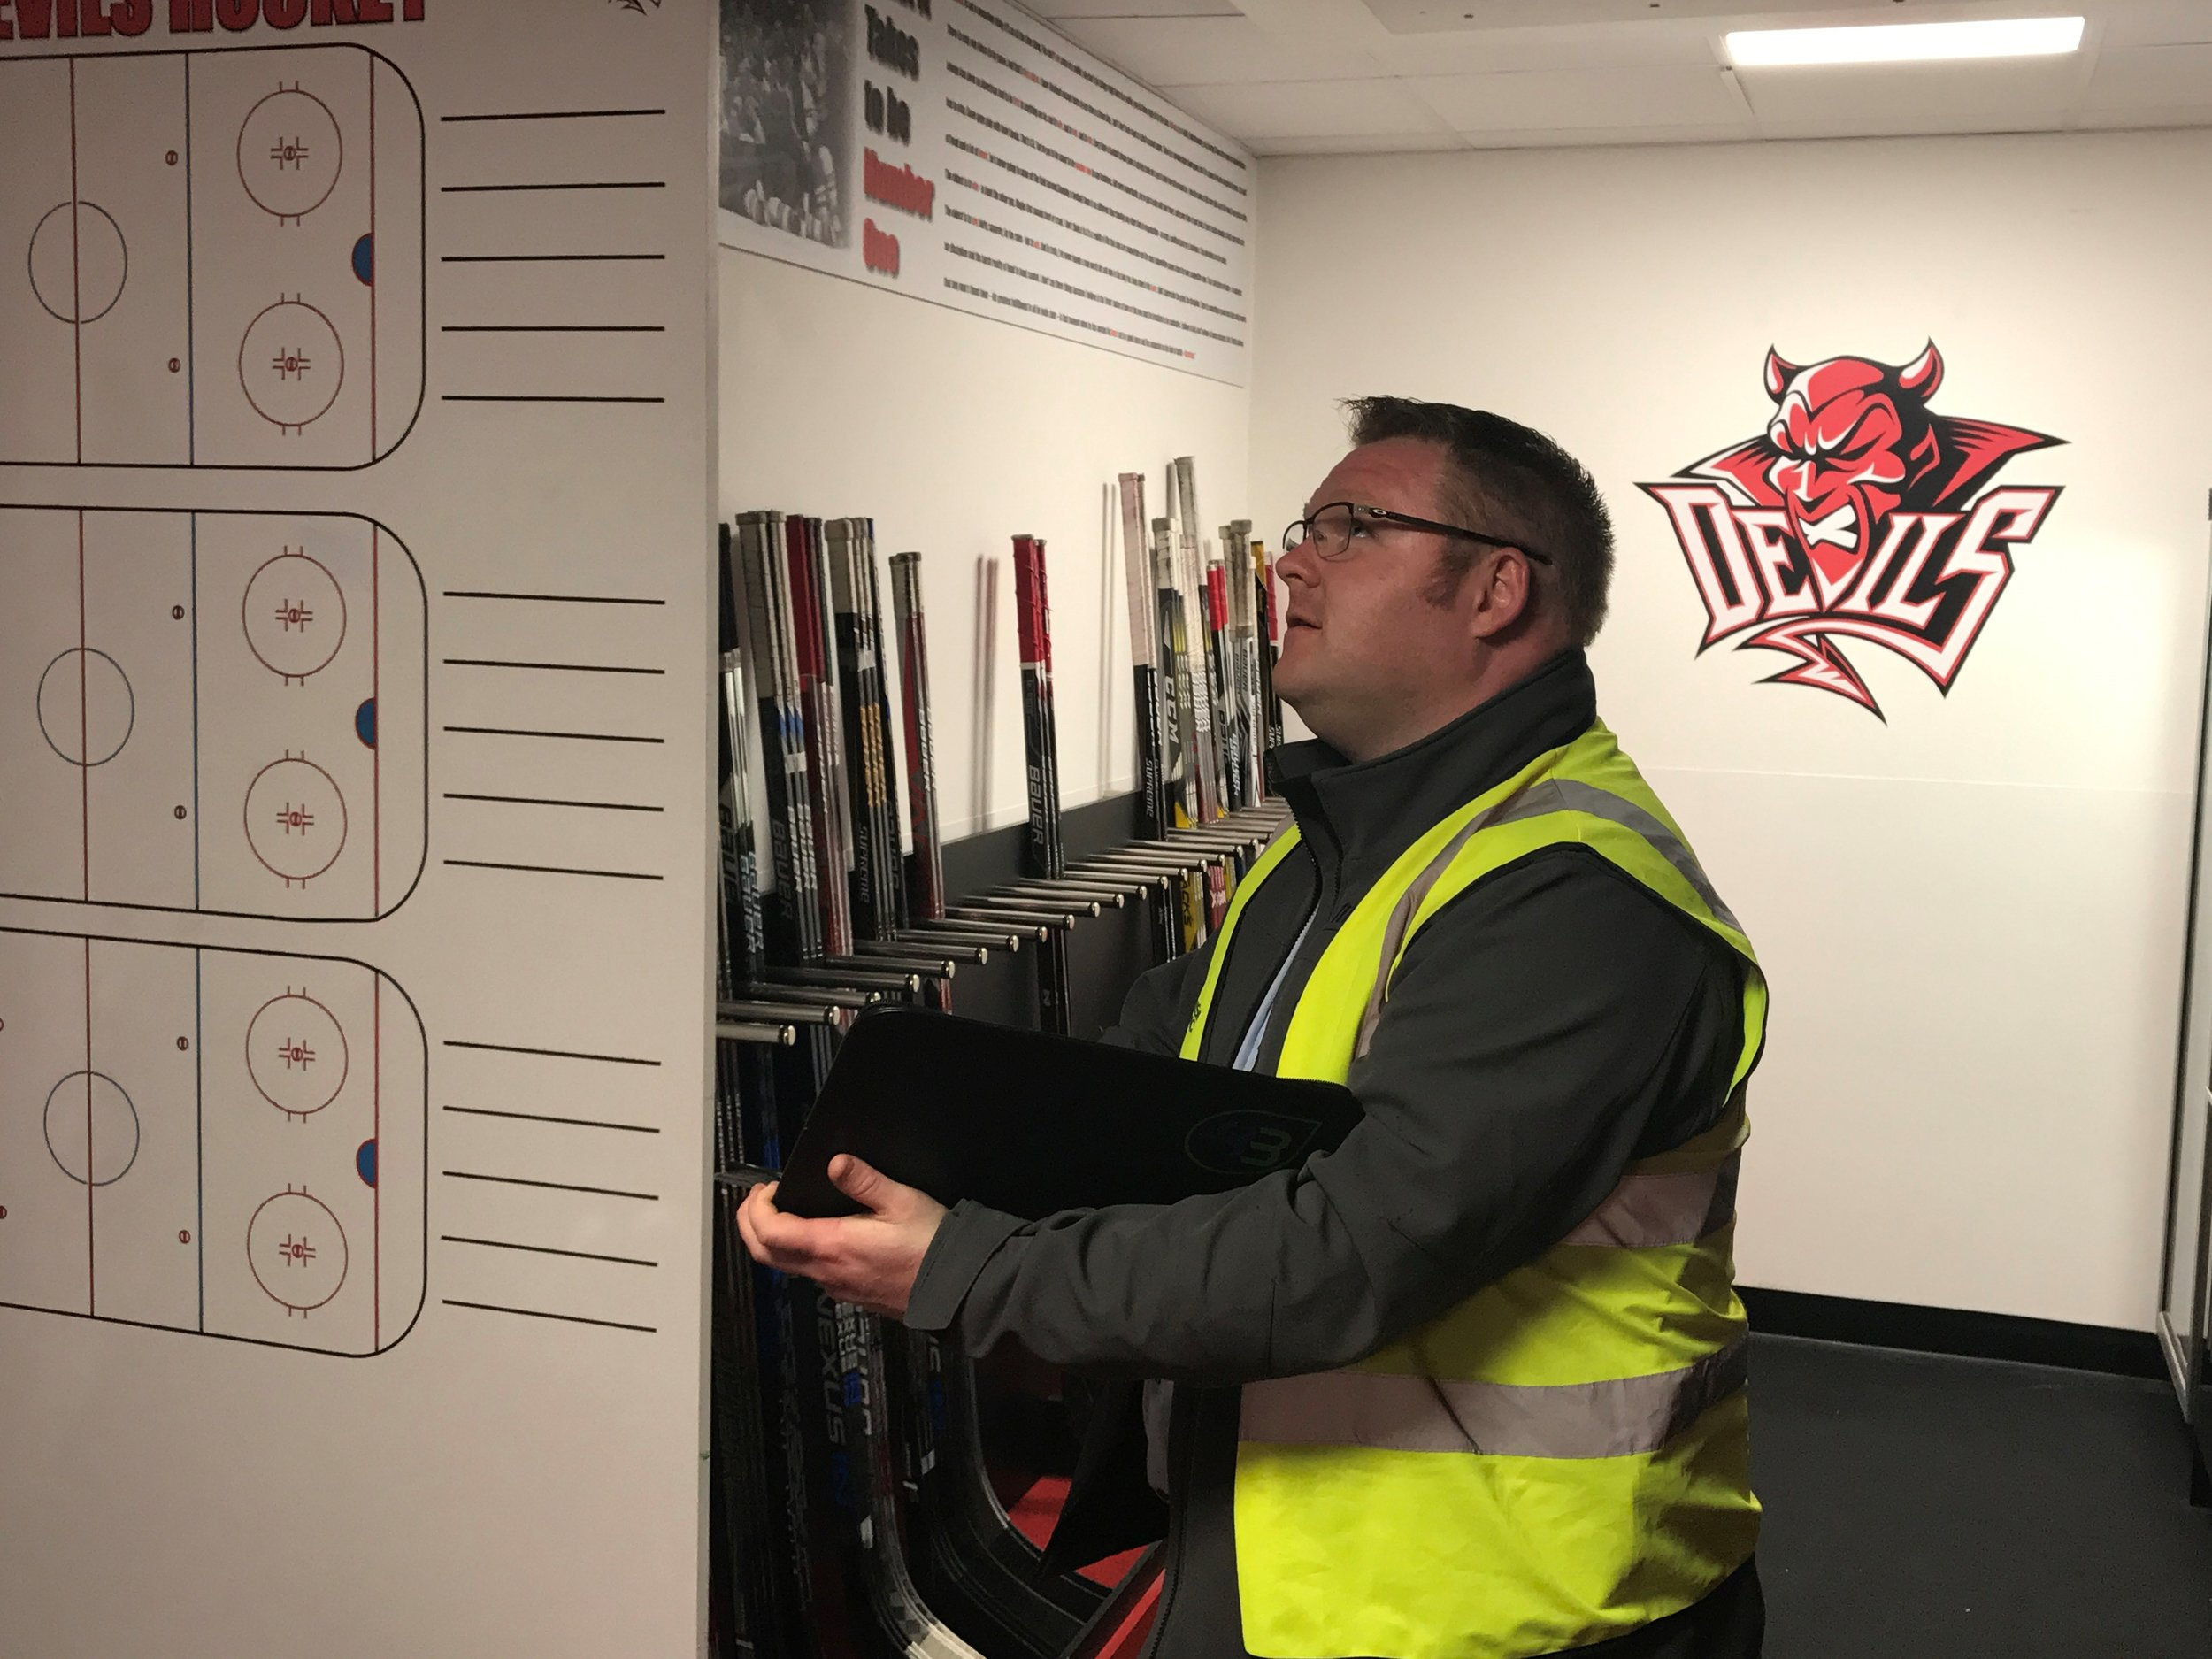 Cardiff Devils Ice Hockey